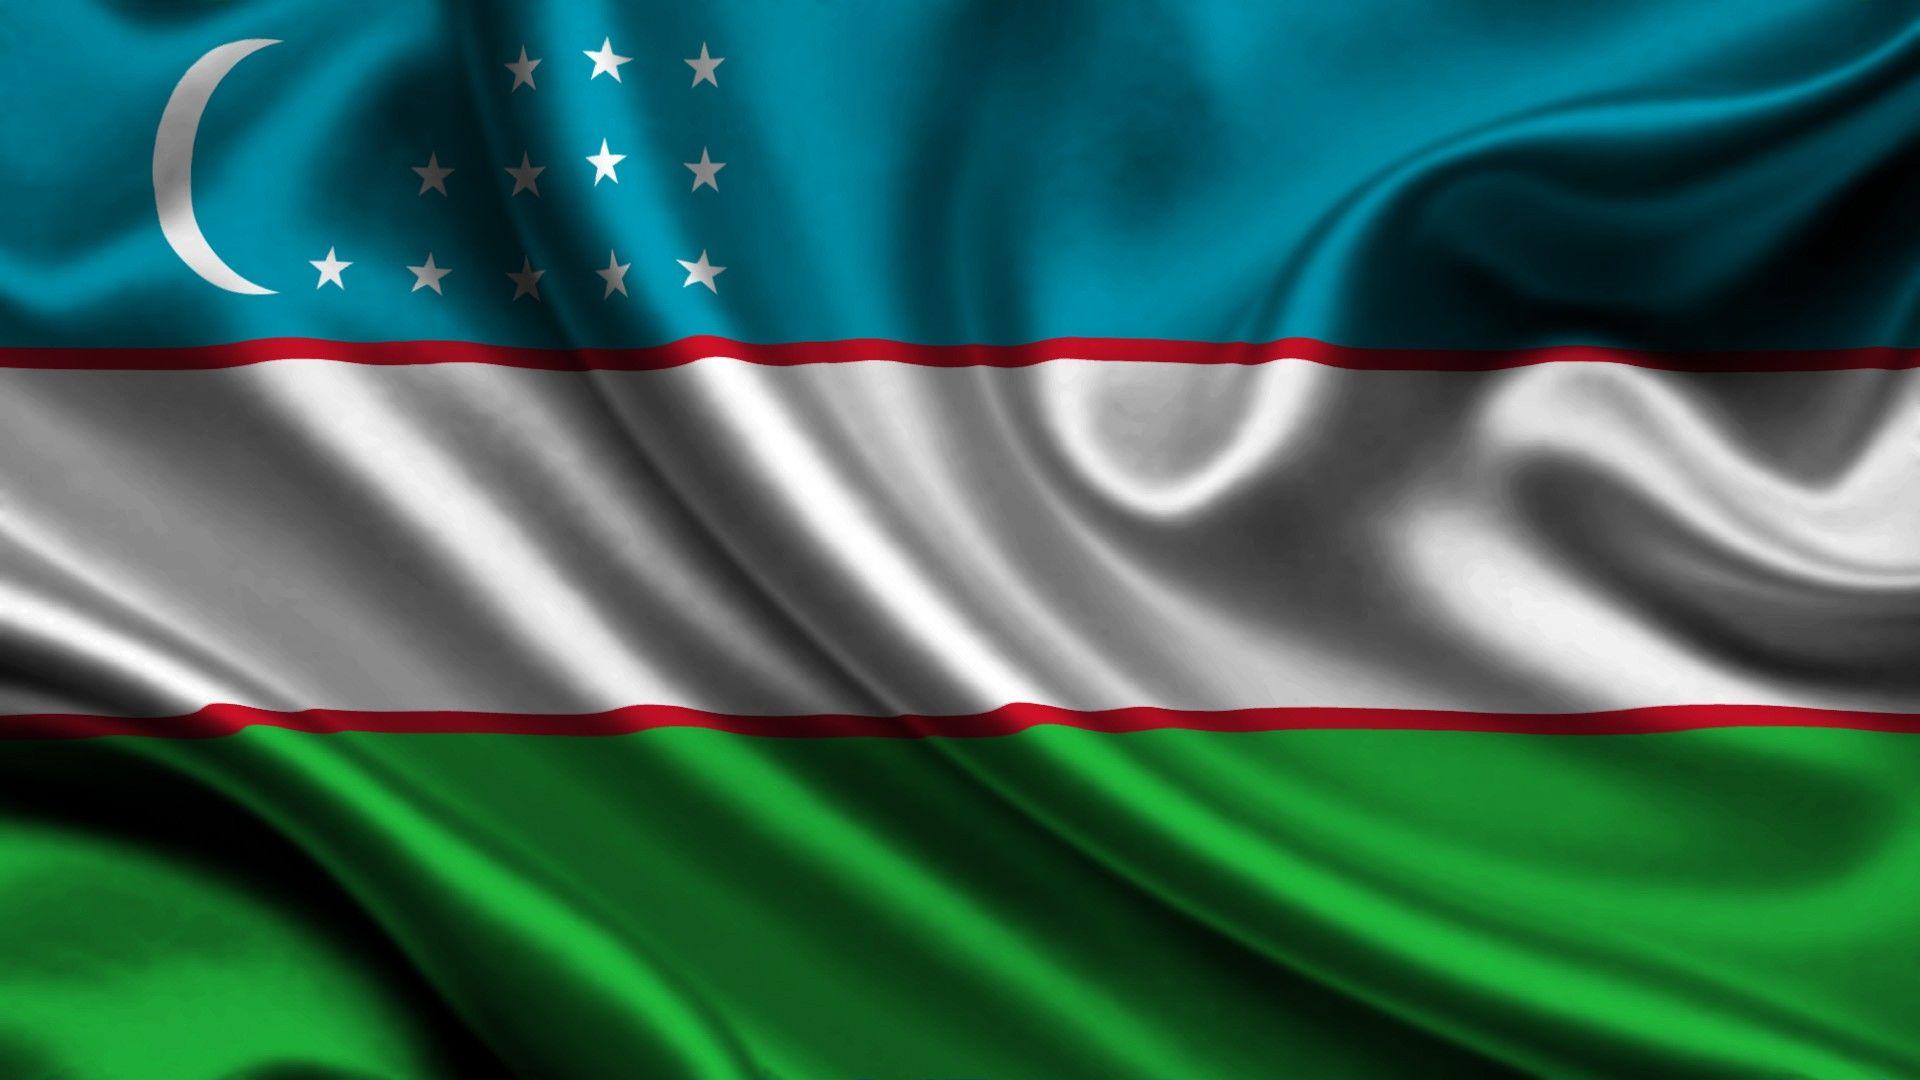 Flag of Uzbekistan wallpaper Flags wallpaper Argentina flag 1920x1080